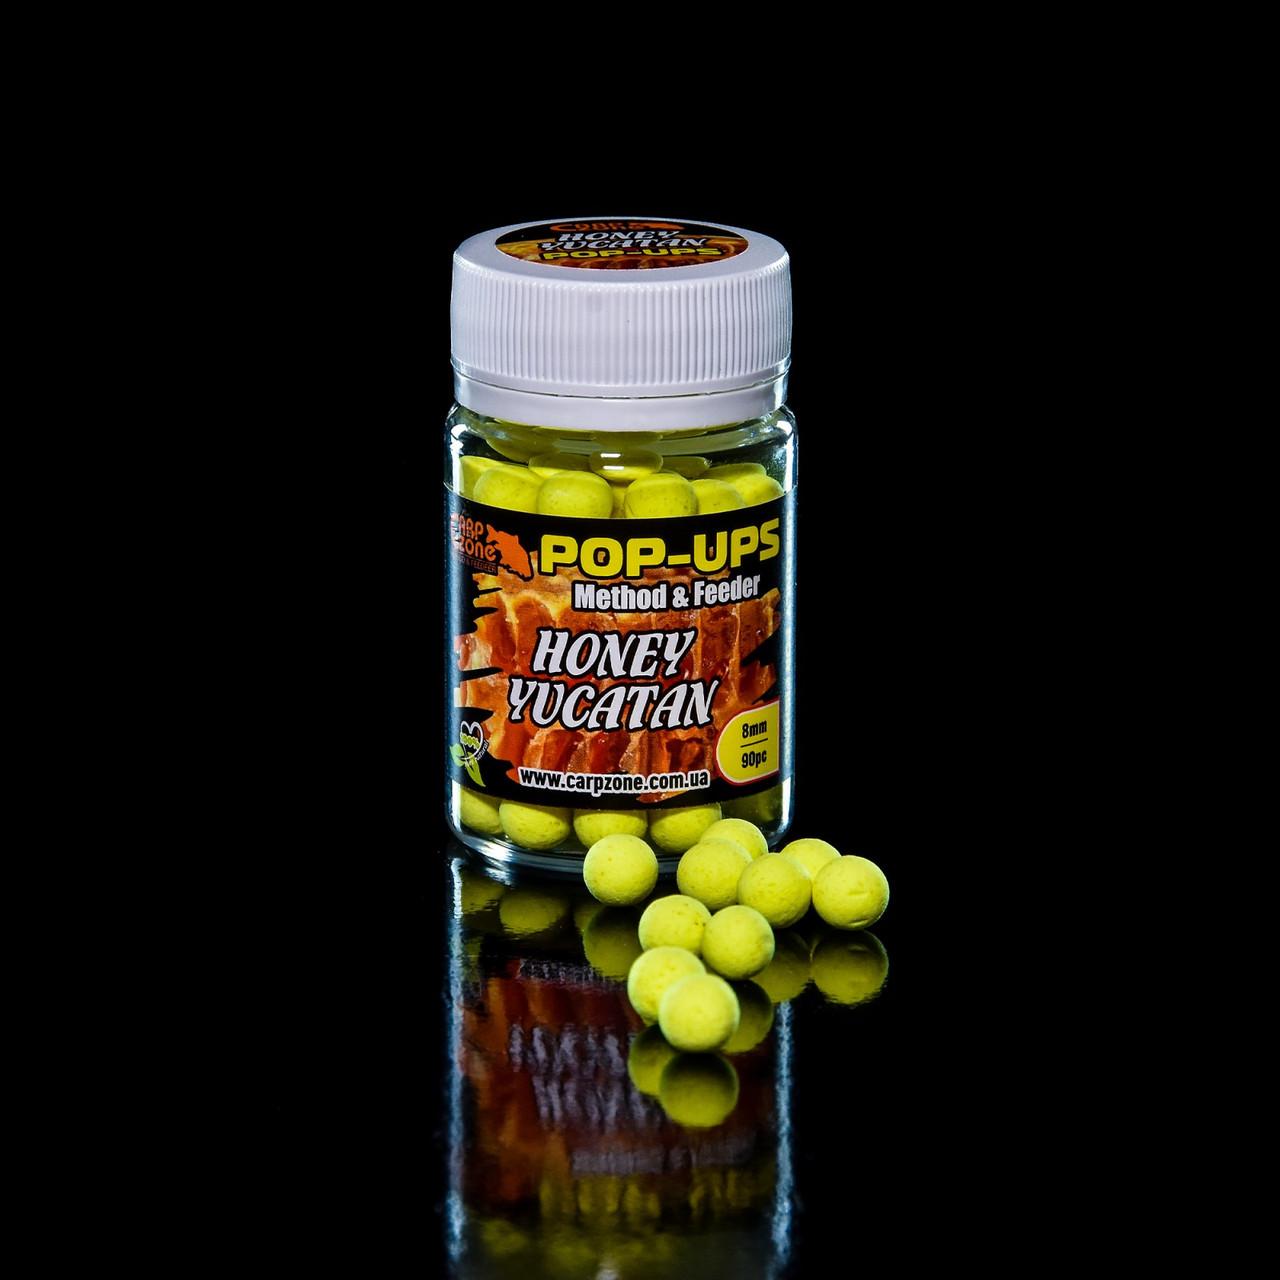 Поп Ап CarpZone Pop-Ups Method & Feeder Honey Yucatan (Мед Юкатан) 8mm/90pc